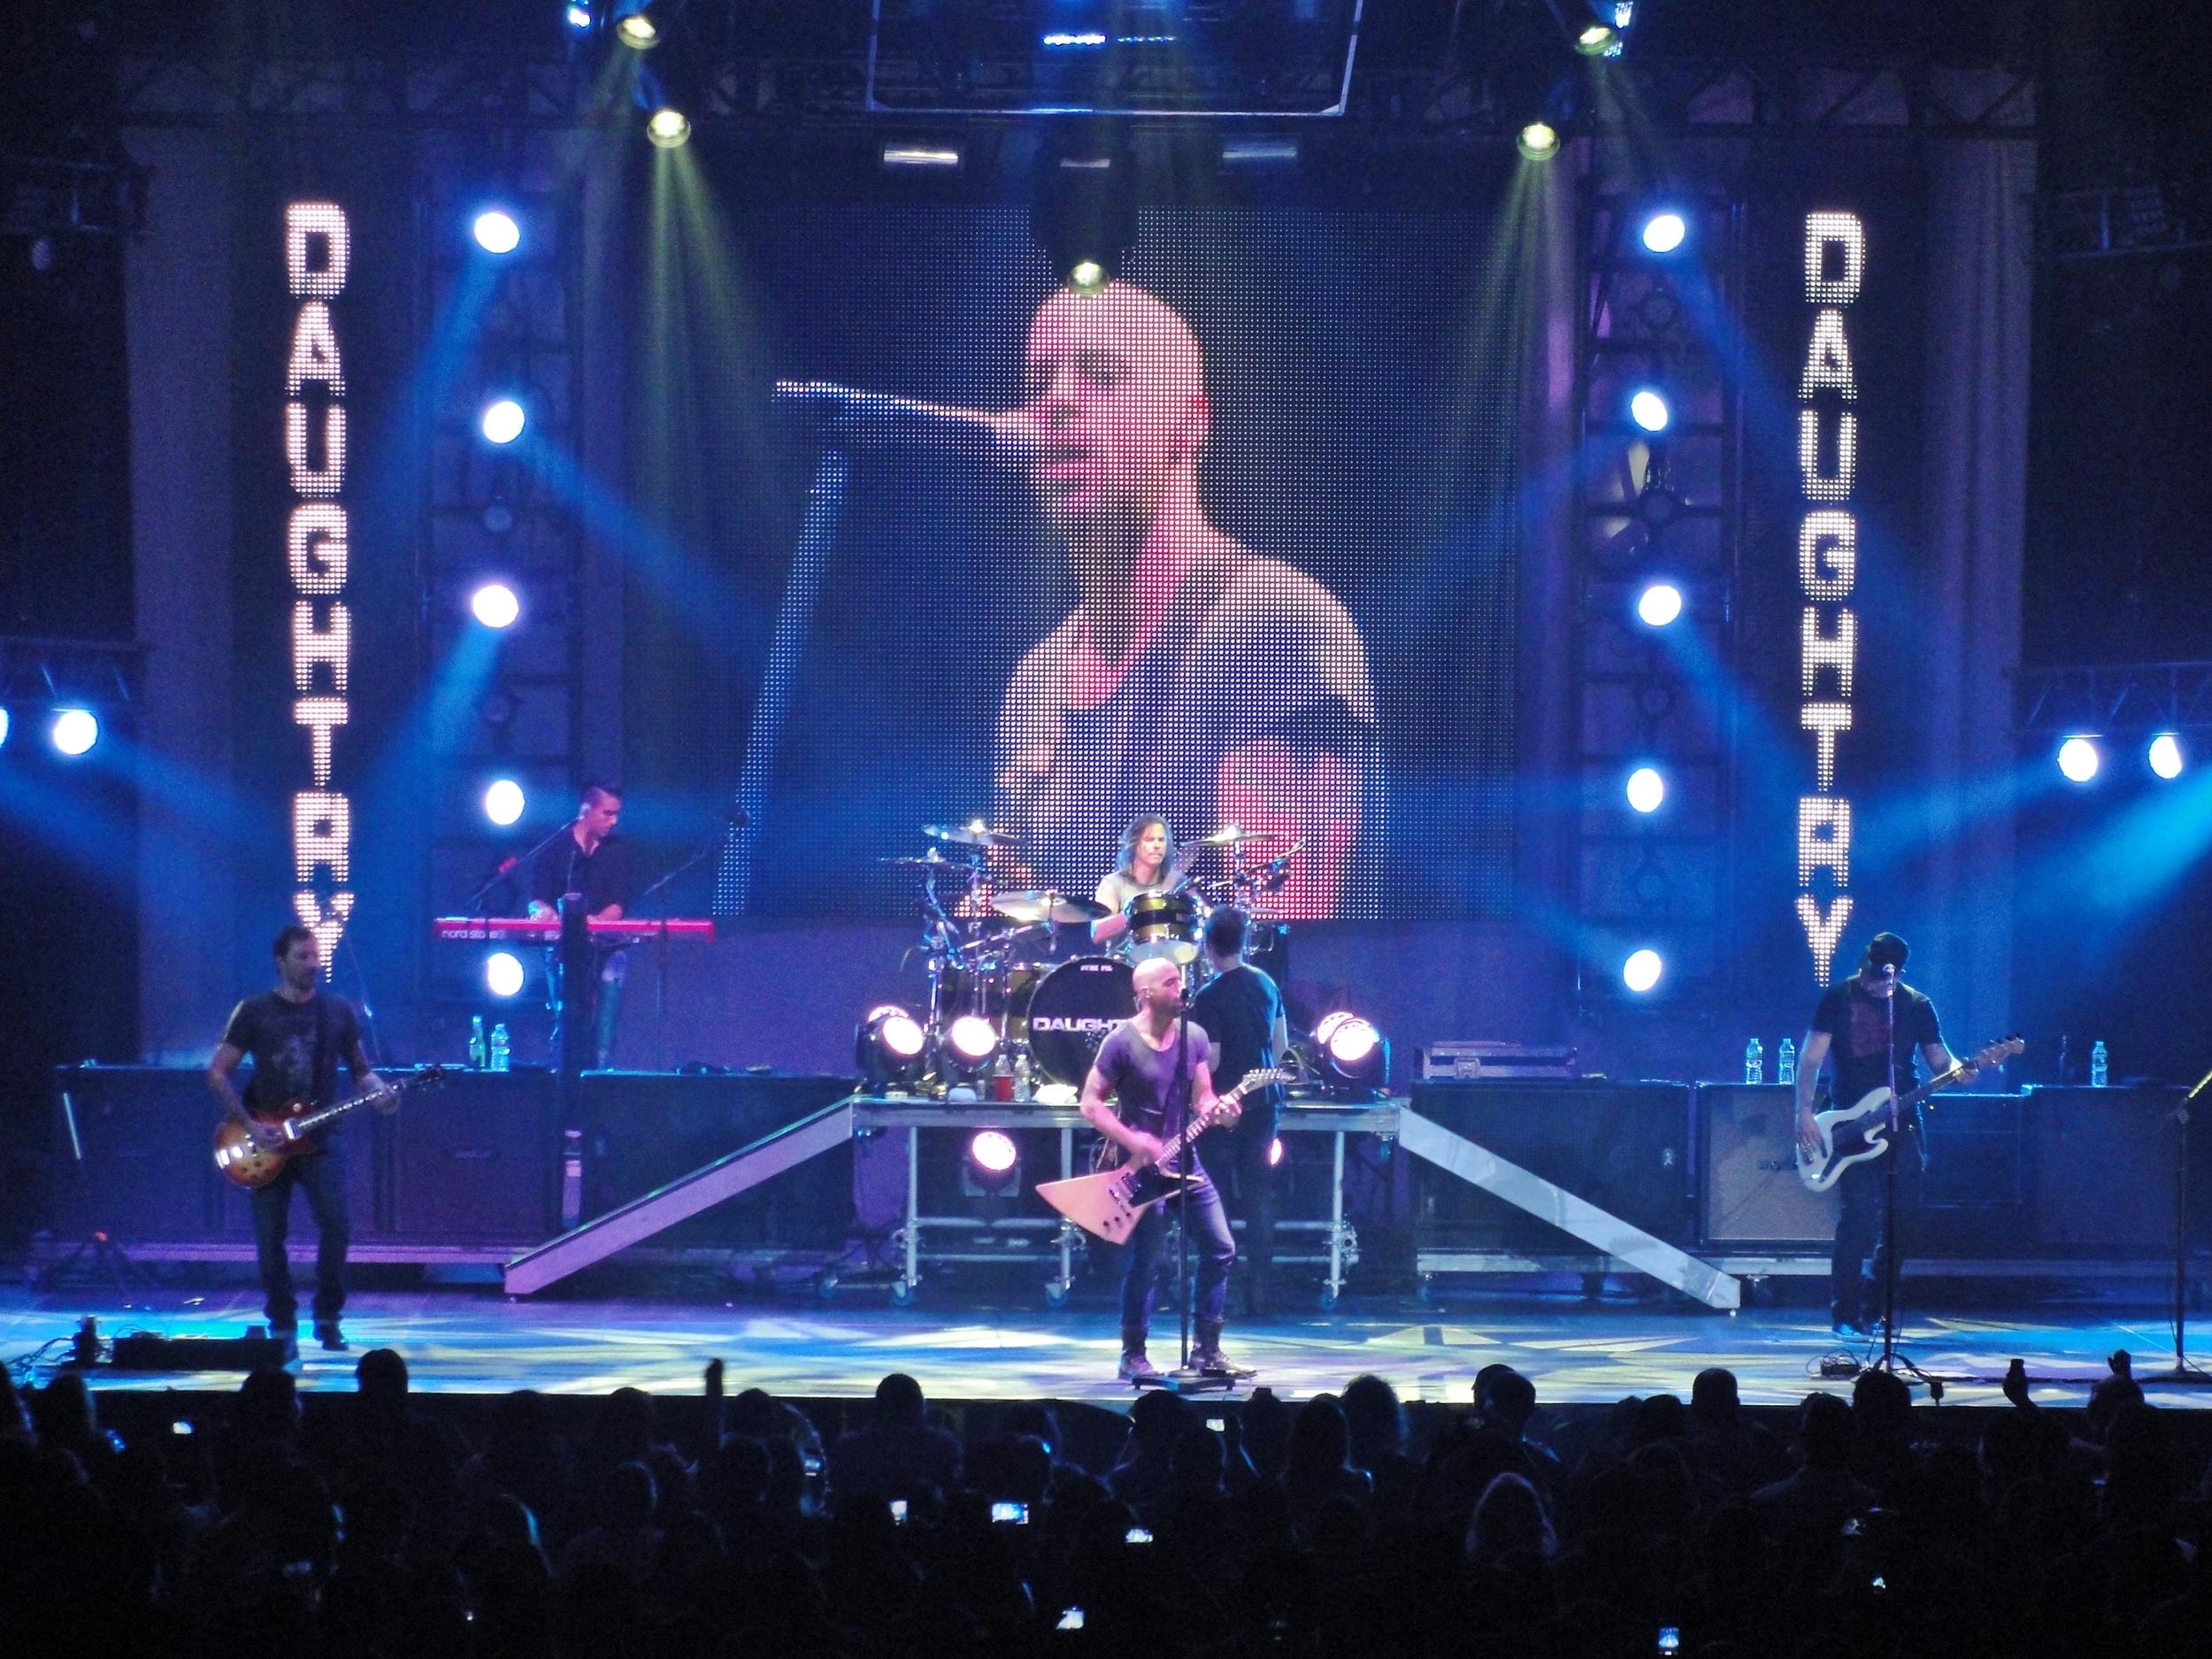 Daughtry_live_at_Laredo_Energy_Arena_in_Laredo,_Texas.JPG